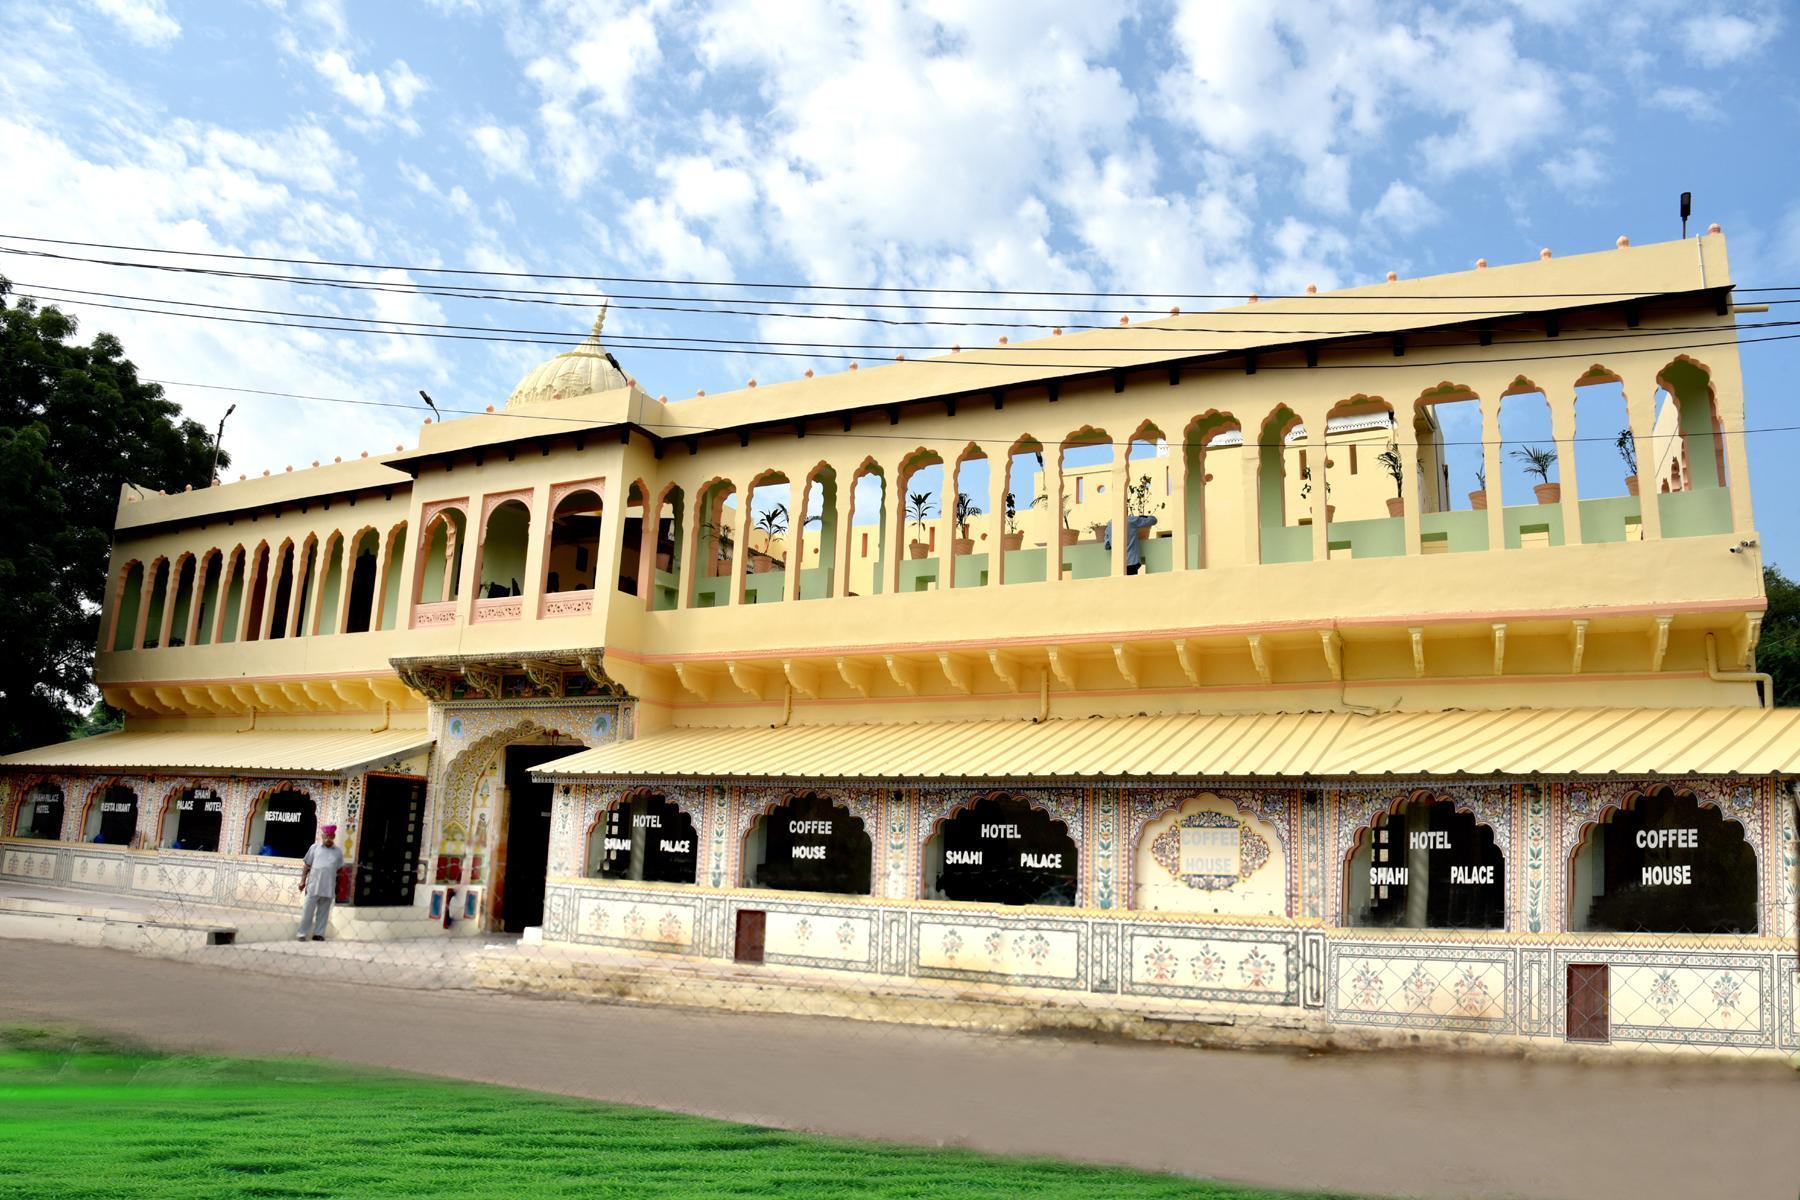 Dimensioni Standard Tavolo Cucina best price on hotel shahi palace in mandawa + reviews!